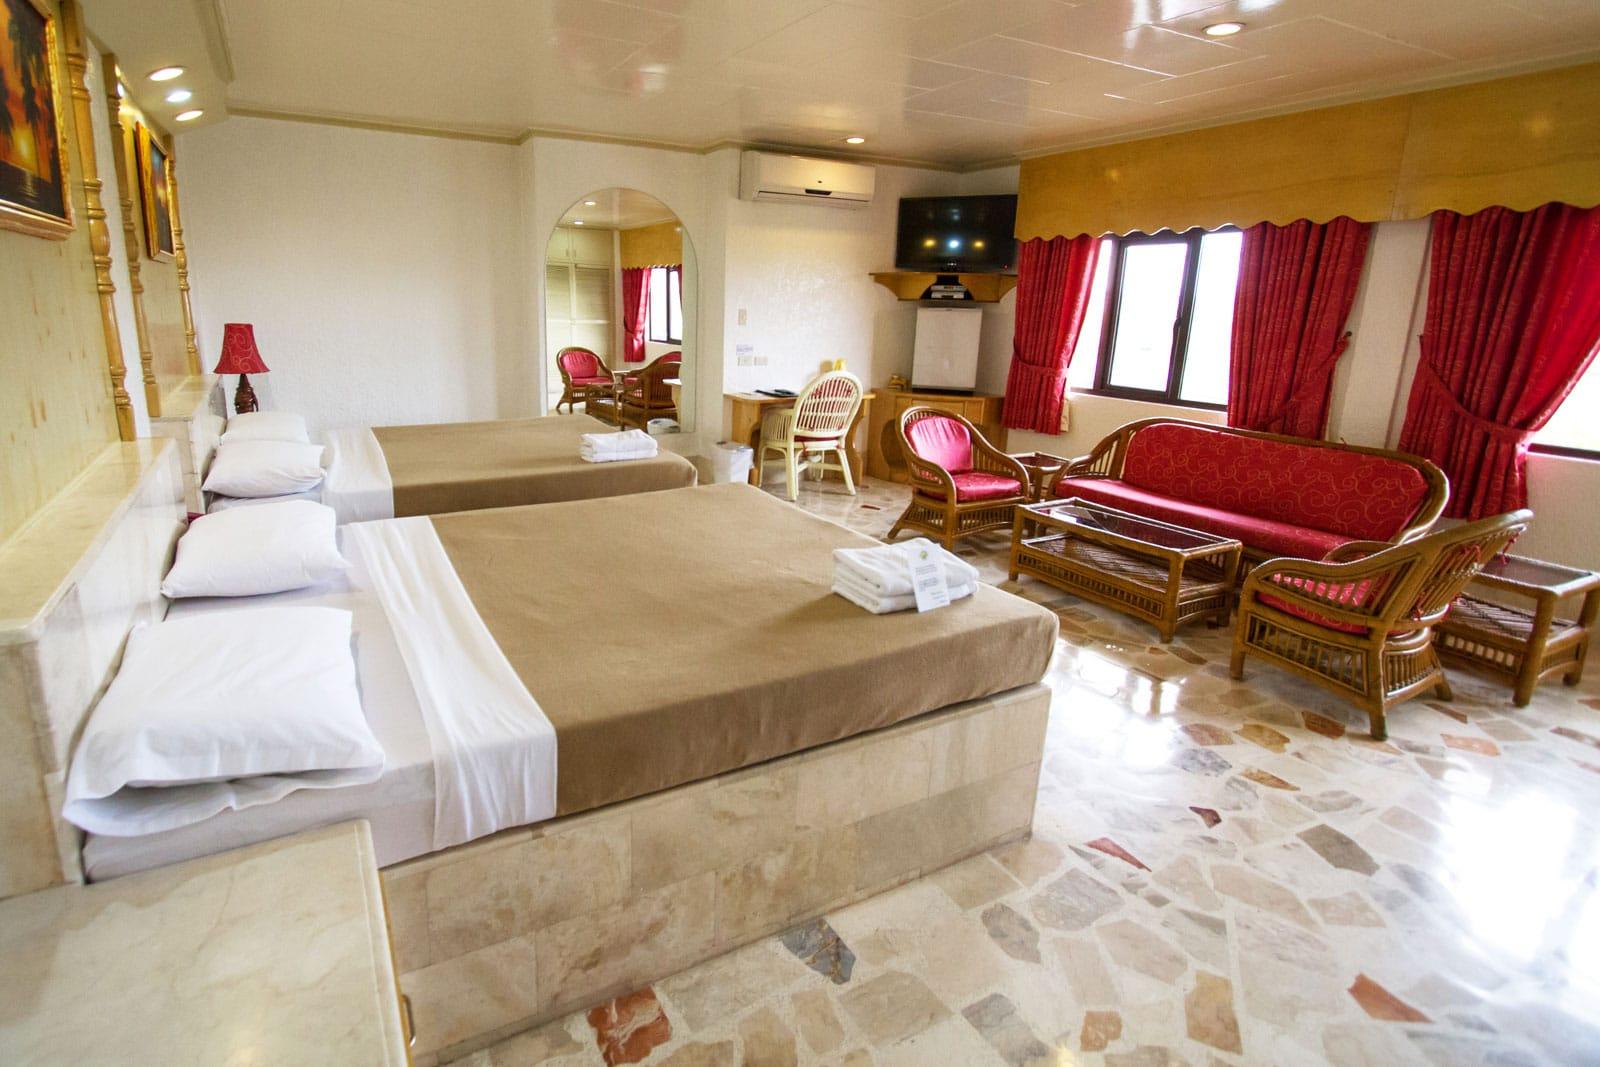 Clarkton Hotel Angeles King Suite 304 4